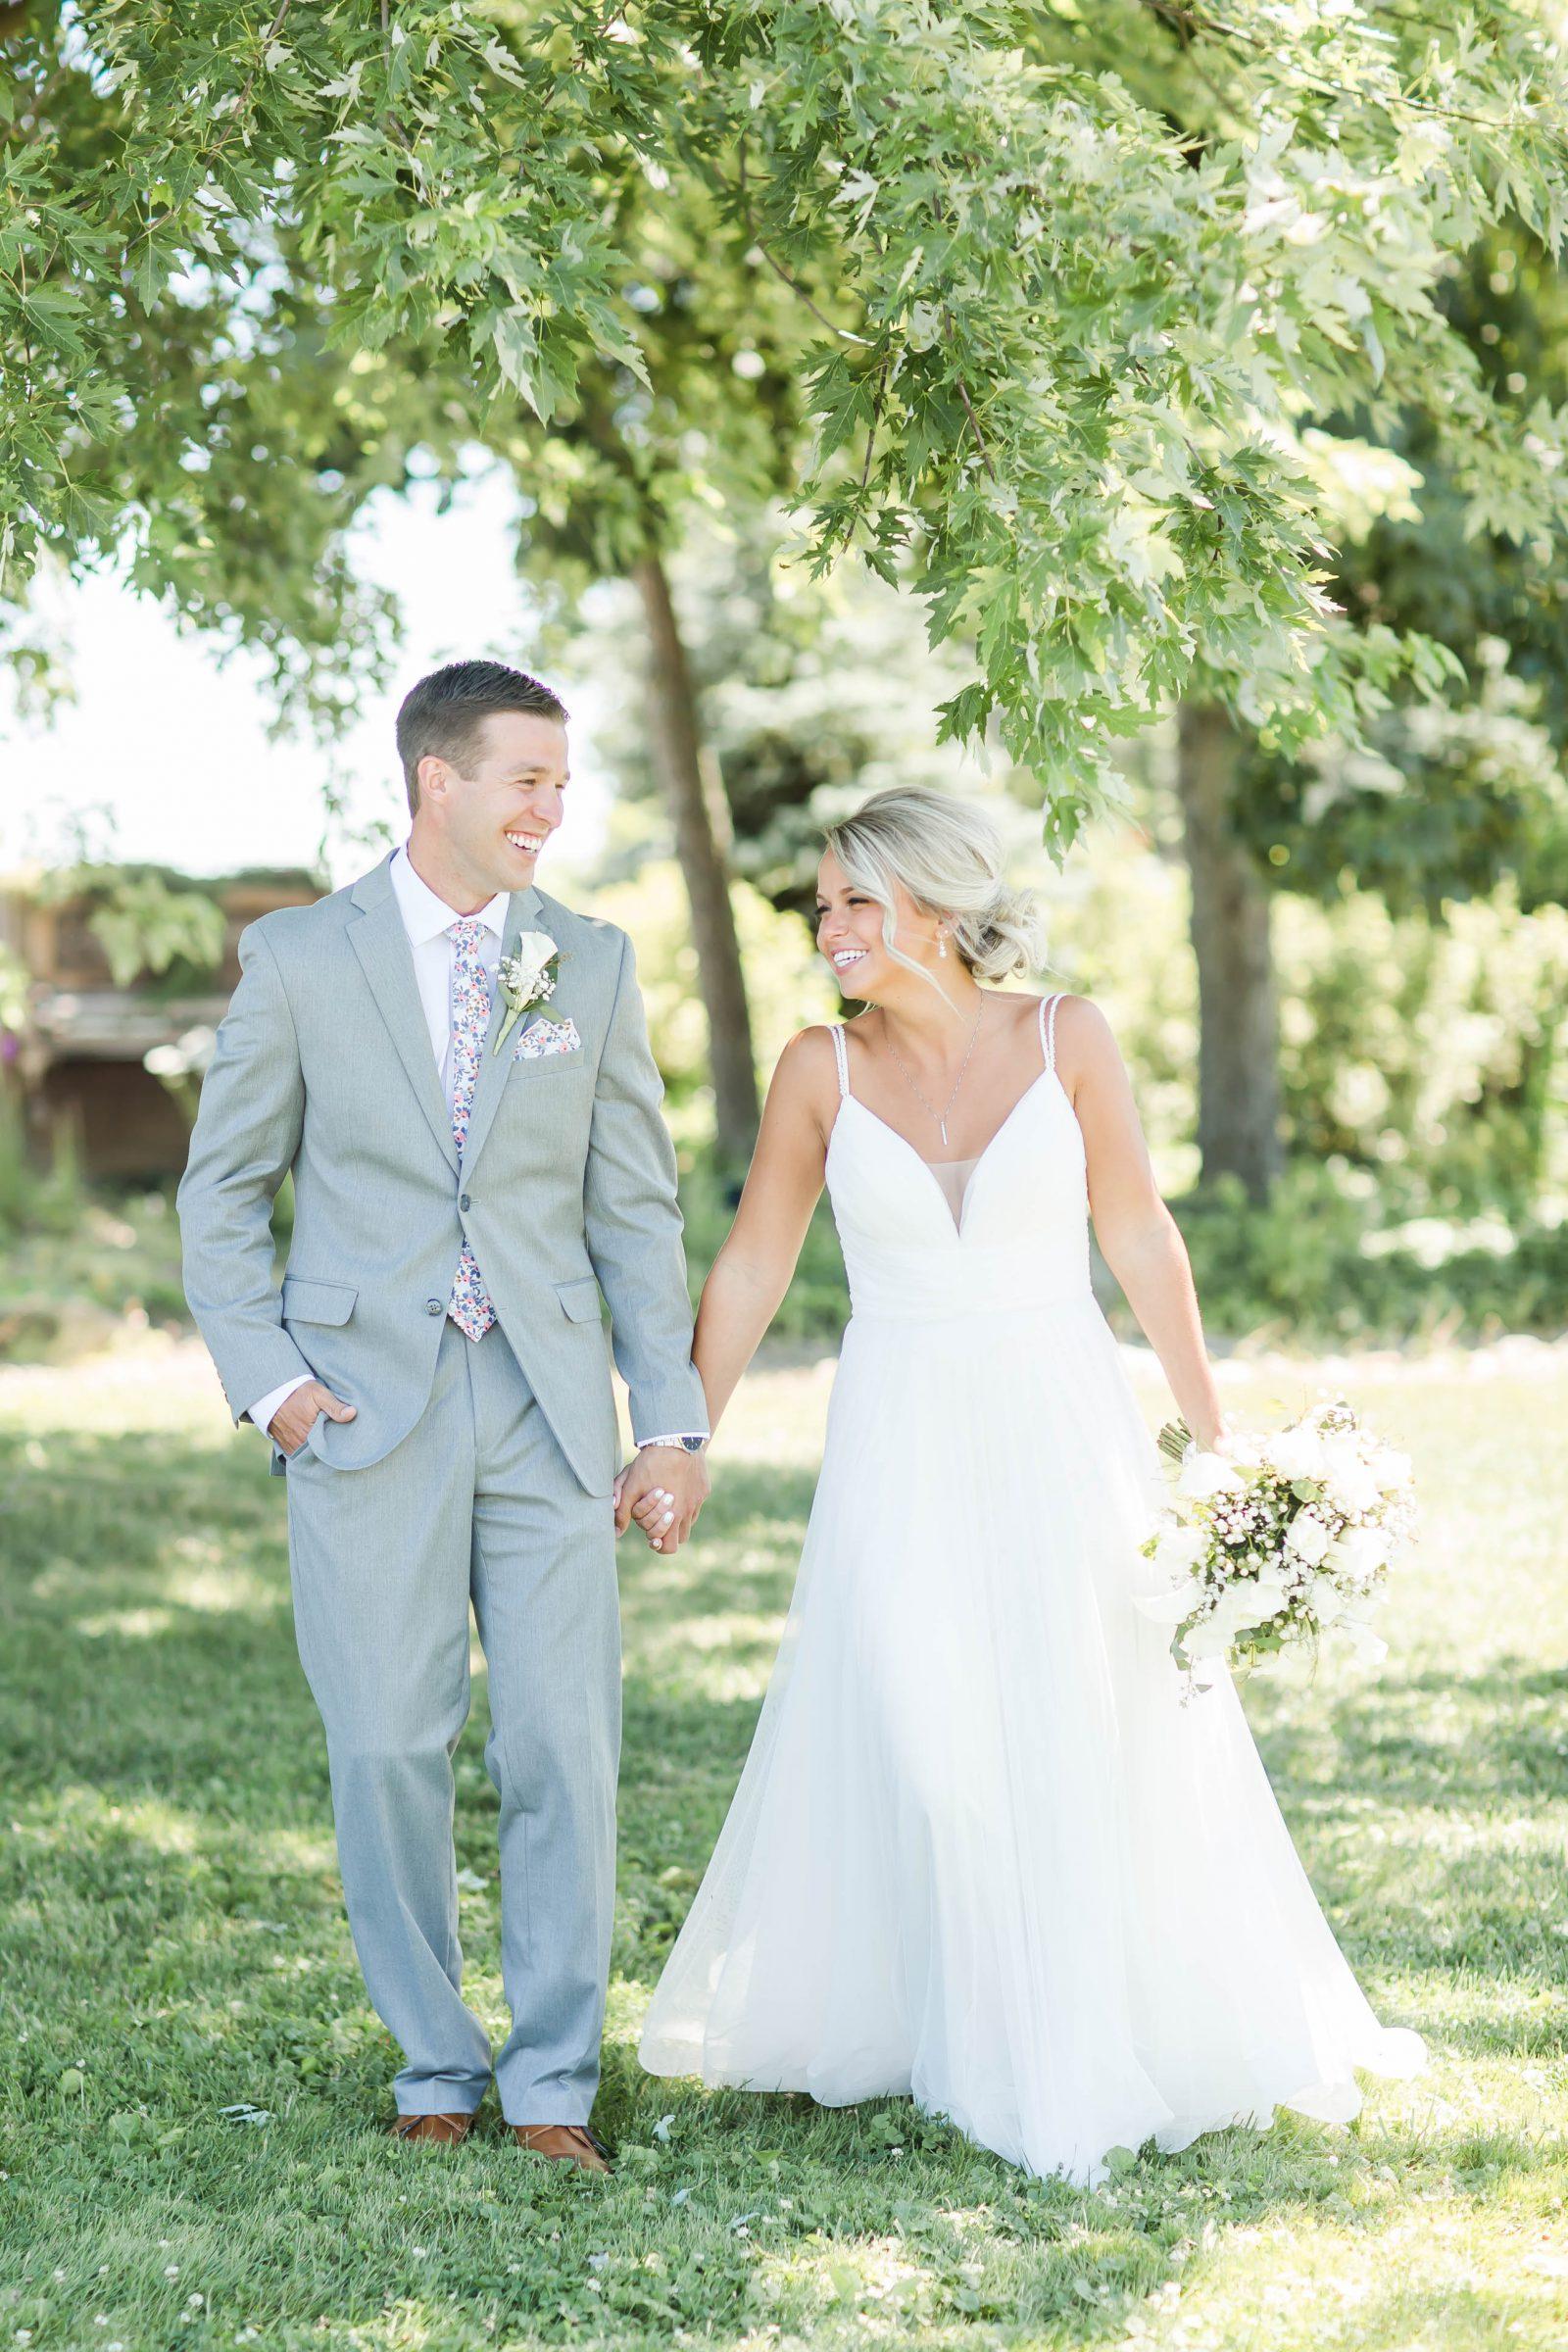 peacock-ridge-summer-wedding-photographer-akron-ohio-loren-jackson-photography-48